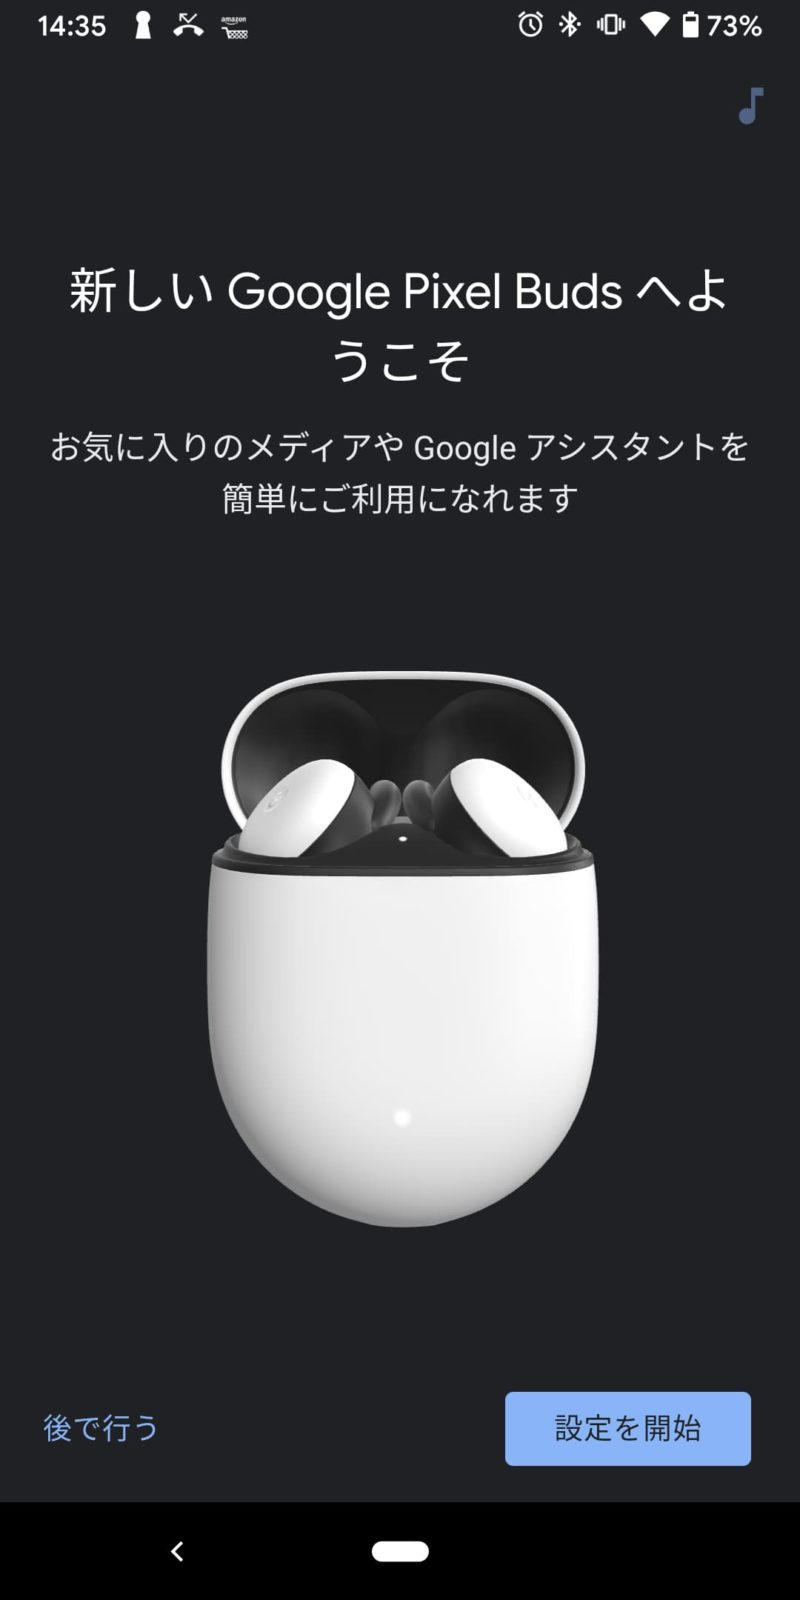 Screenshot 20200514 143537 800x1600-「Google Pixel Buds (2020)」を実機レビュー。完全ワイヤレスになって満足だけど、機能面は物足りないかも